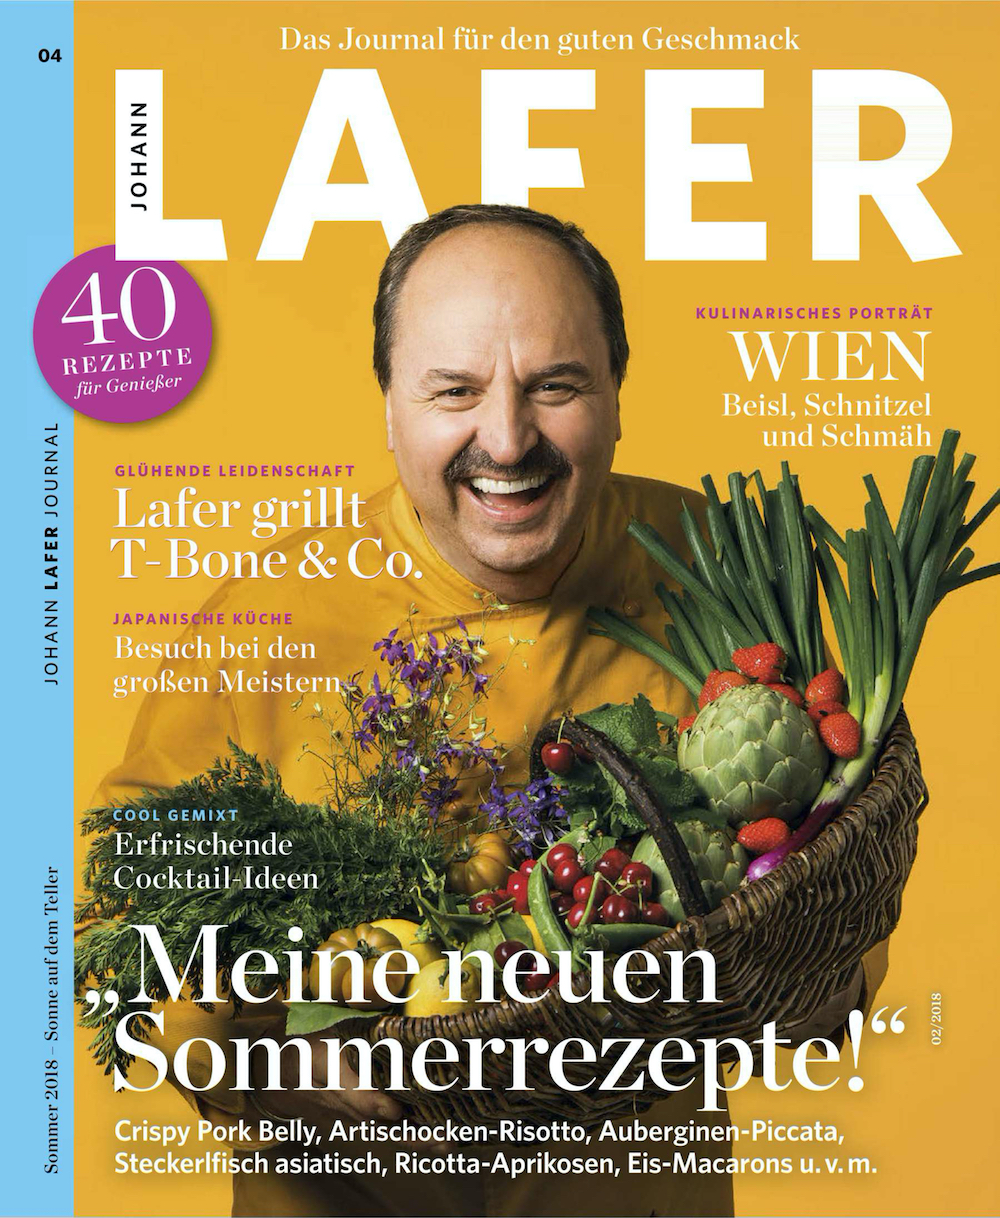 Johann Lafer 2018-04